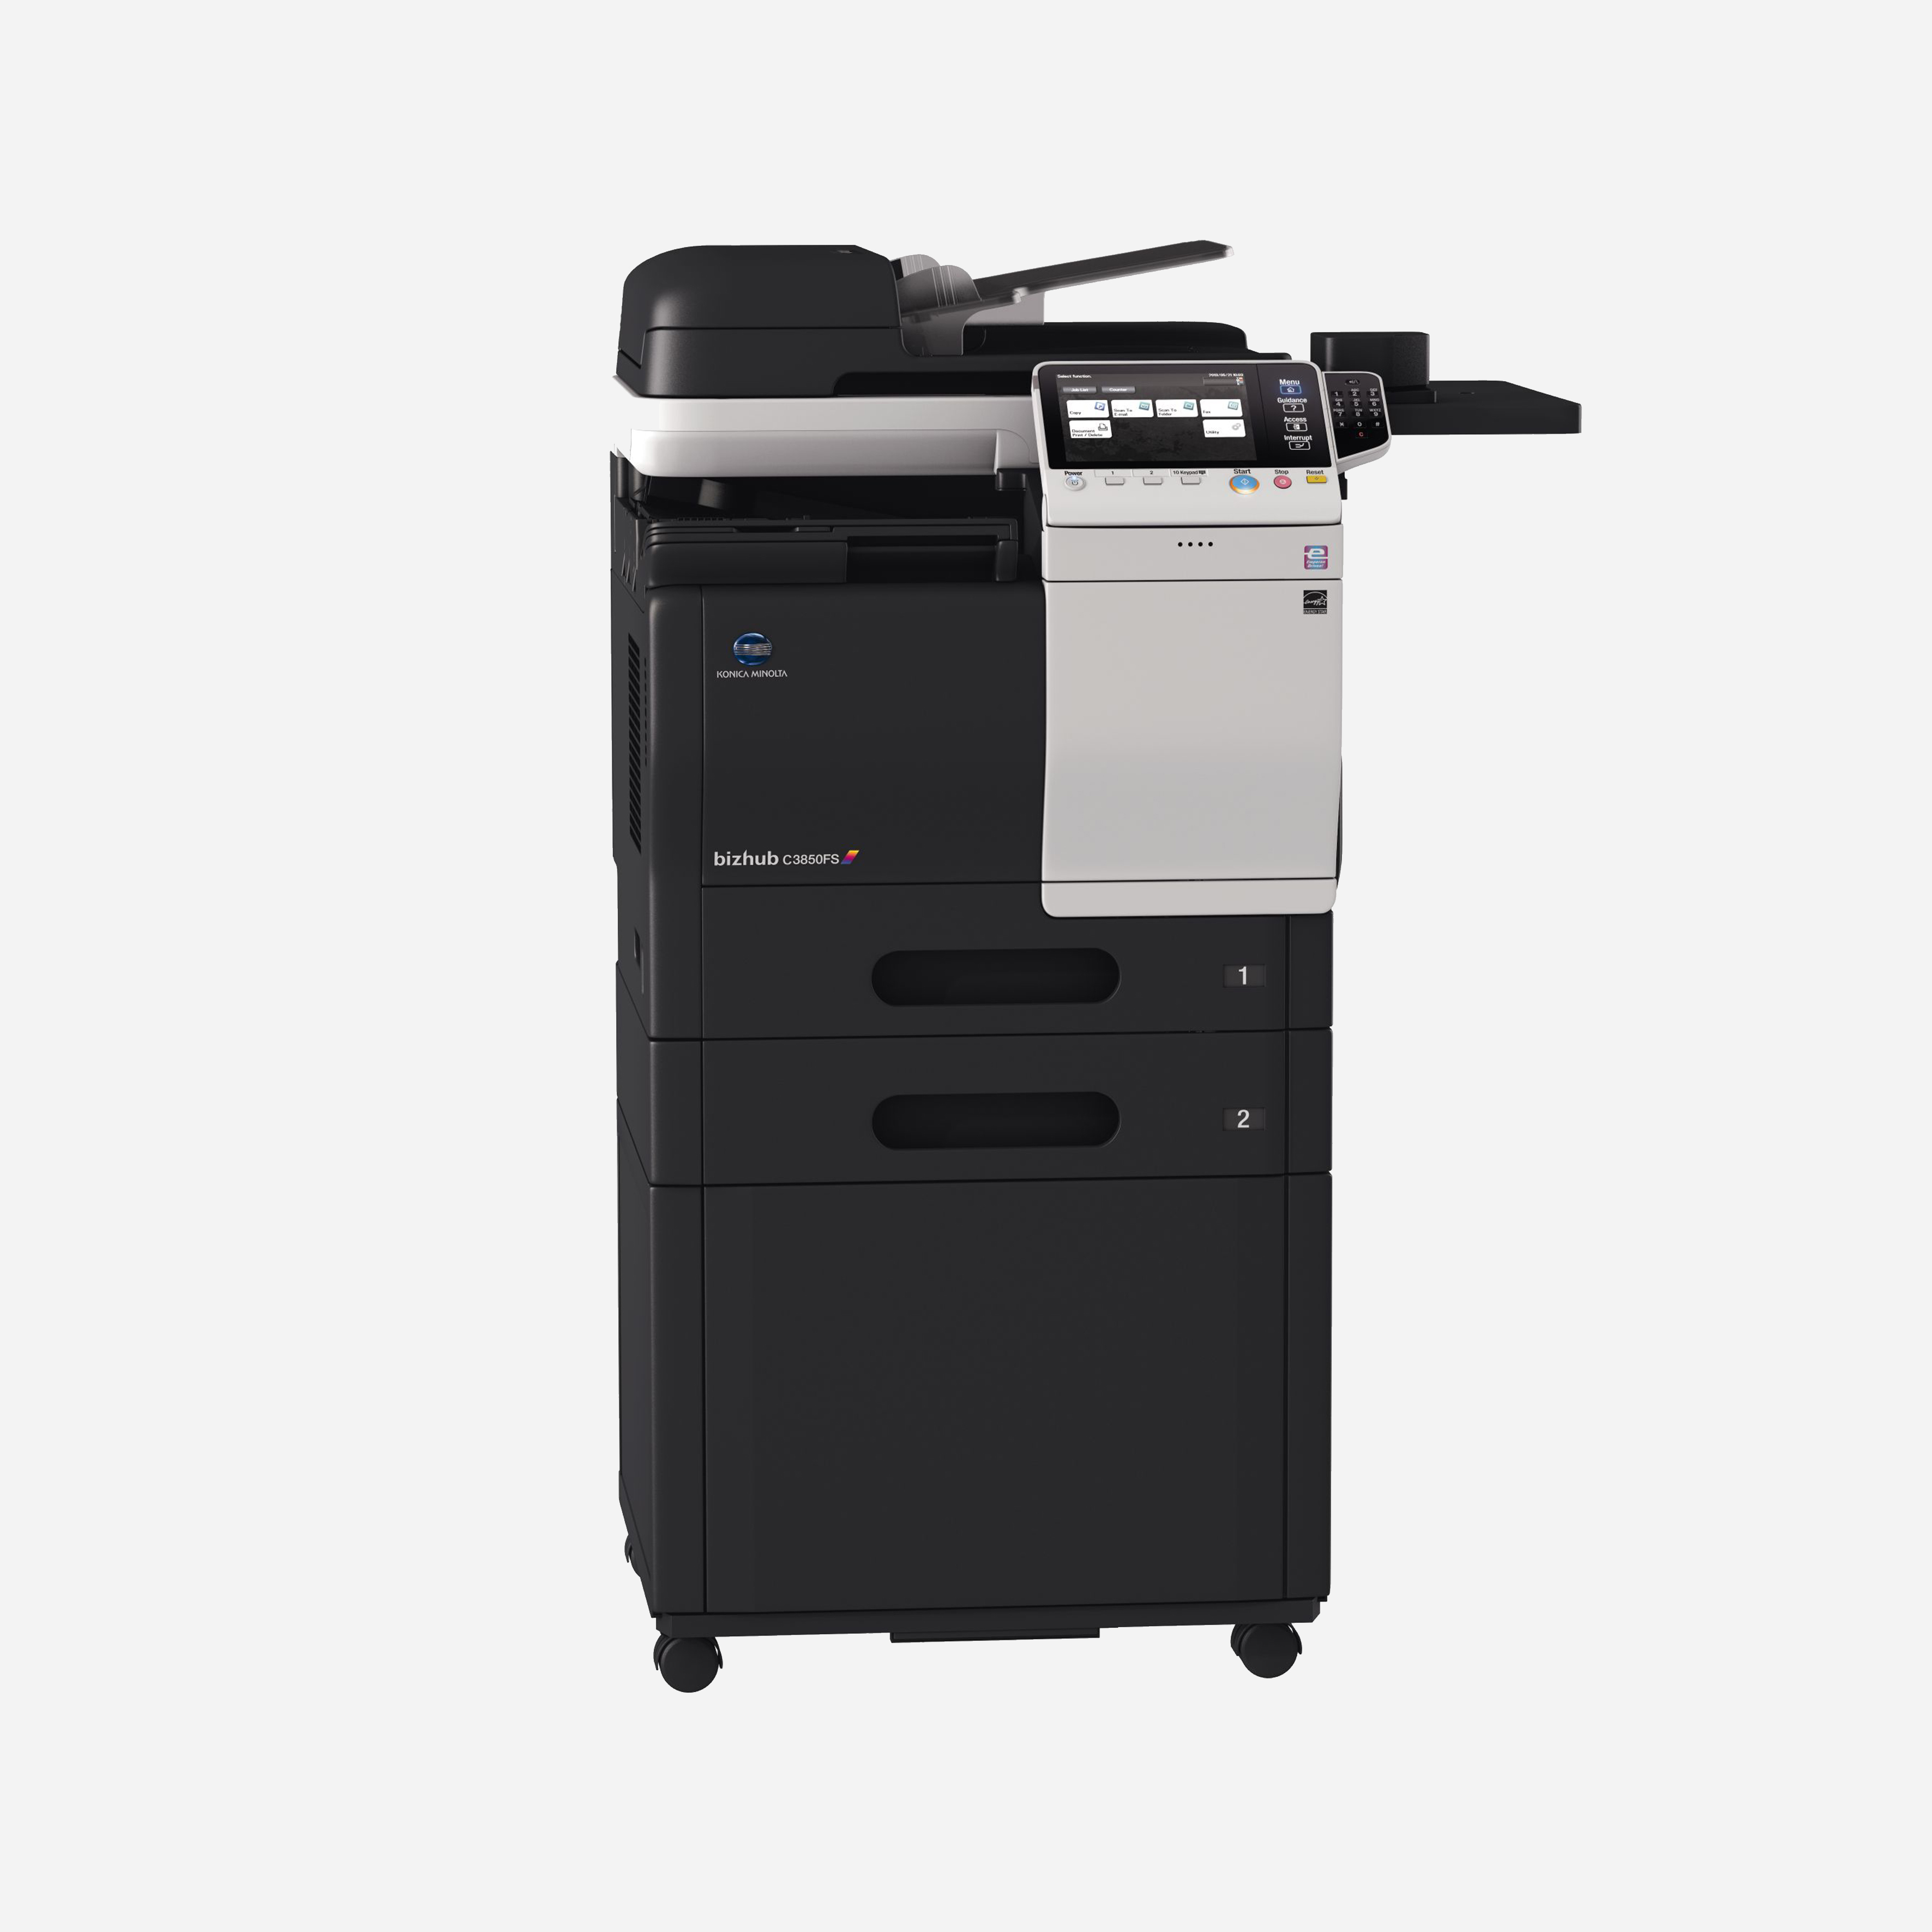 Konica Minolta bizhub C3850FS 38ppm Colour Multifunction Printer